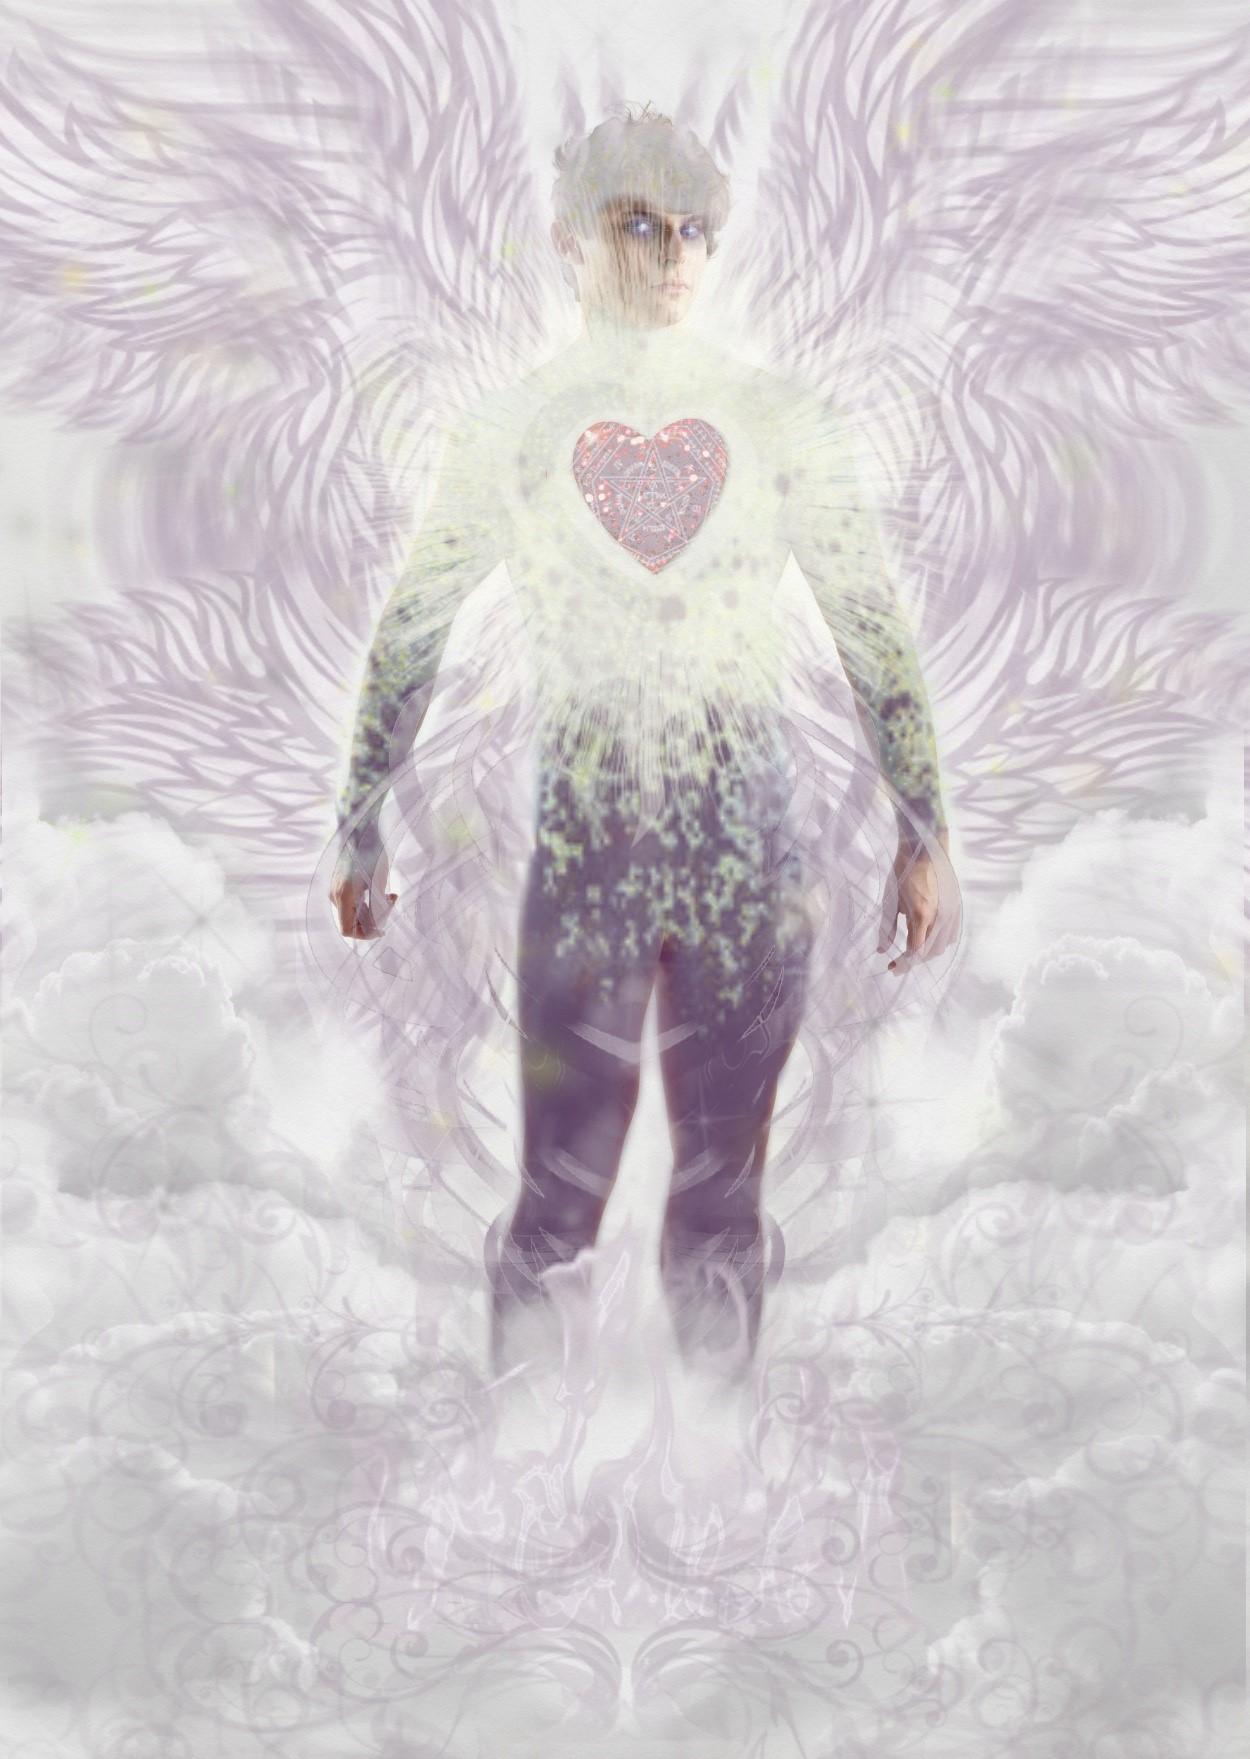 Archangel Tzaphkiel